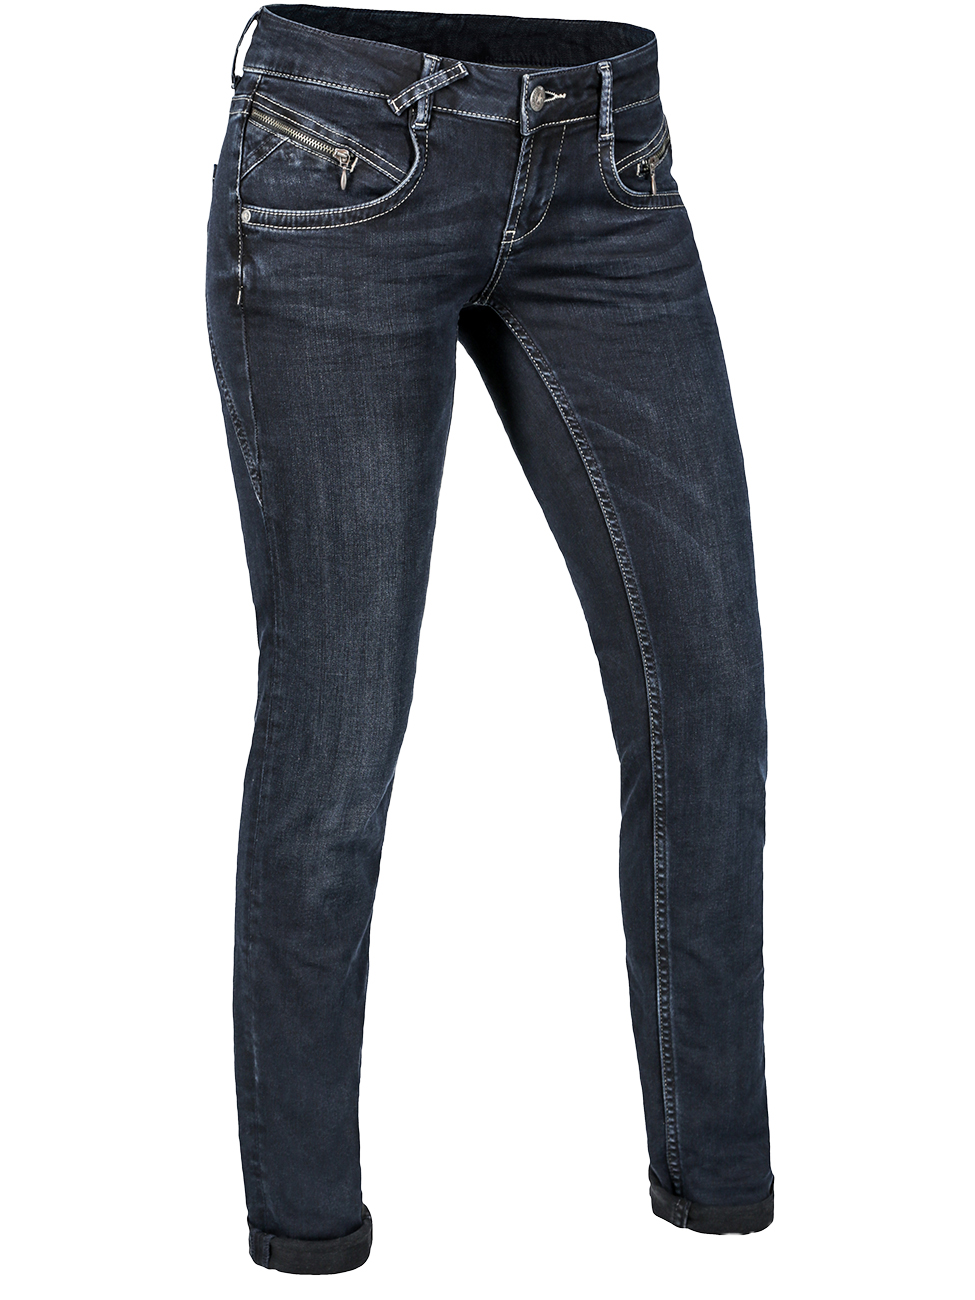 b5f3ccaf9c5128 MOD Damen Jeans Maria Slim Calabria Black kaufen - JEANS-DIRECT.DE